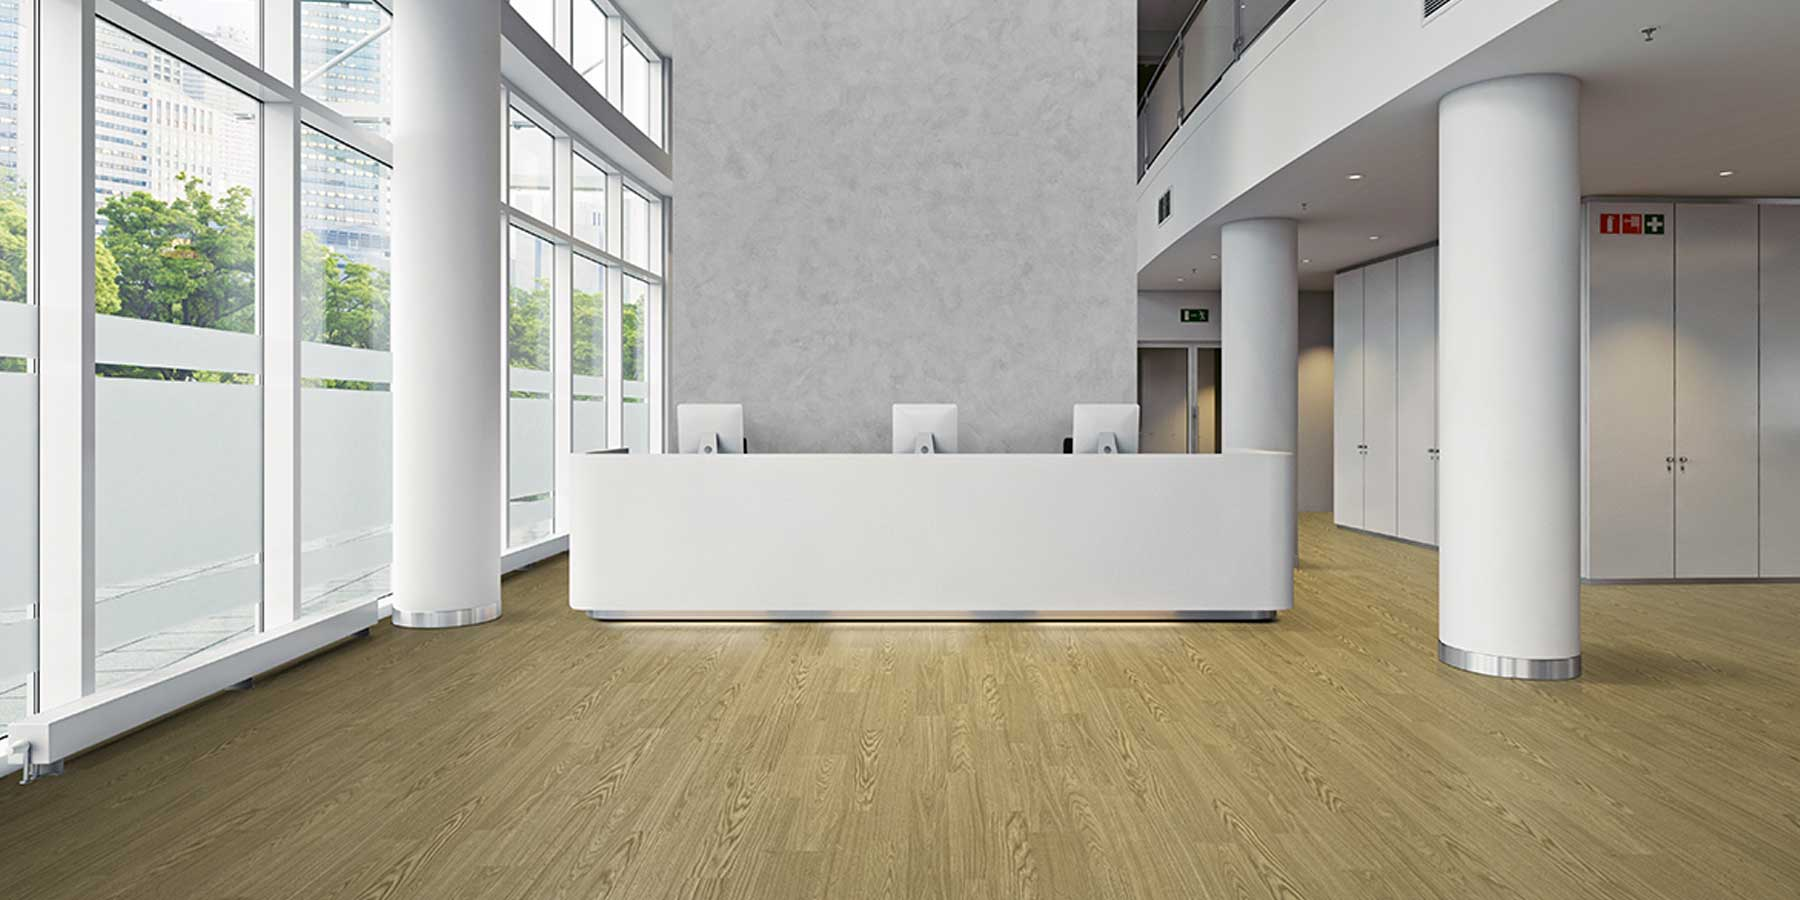 Commercial Wood Flooring from Phoenix Flooring Contrtactors